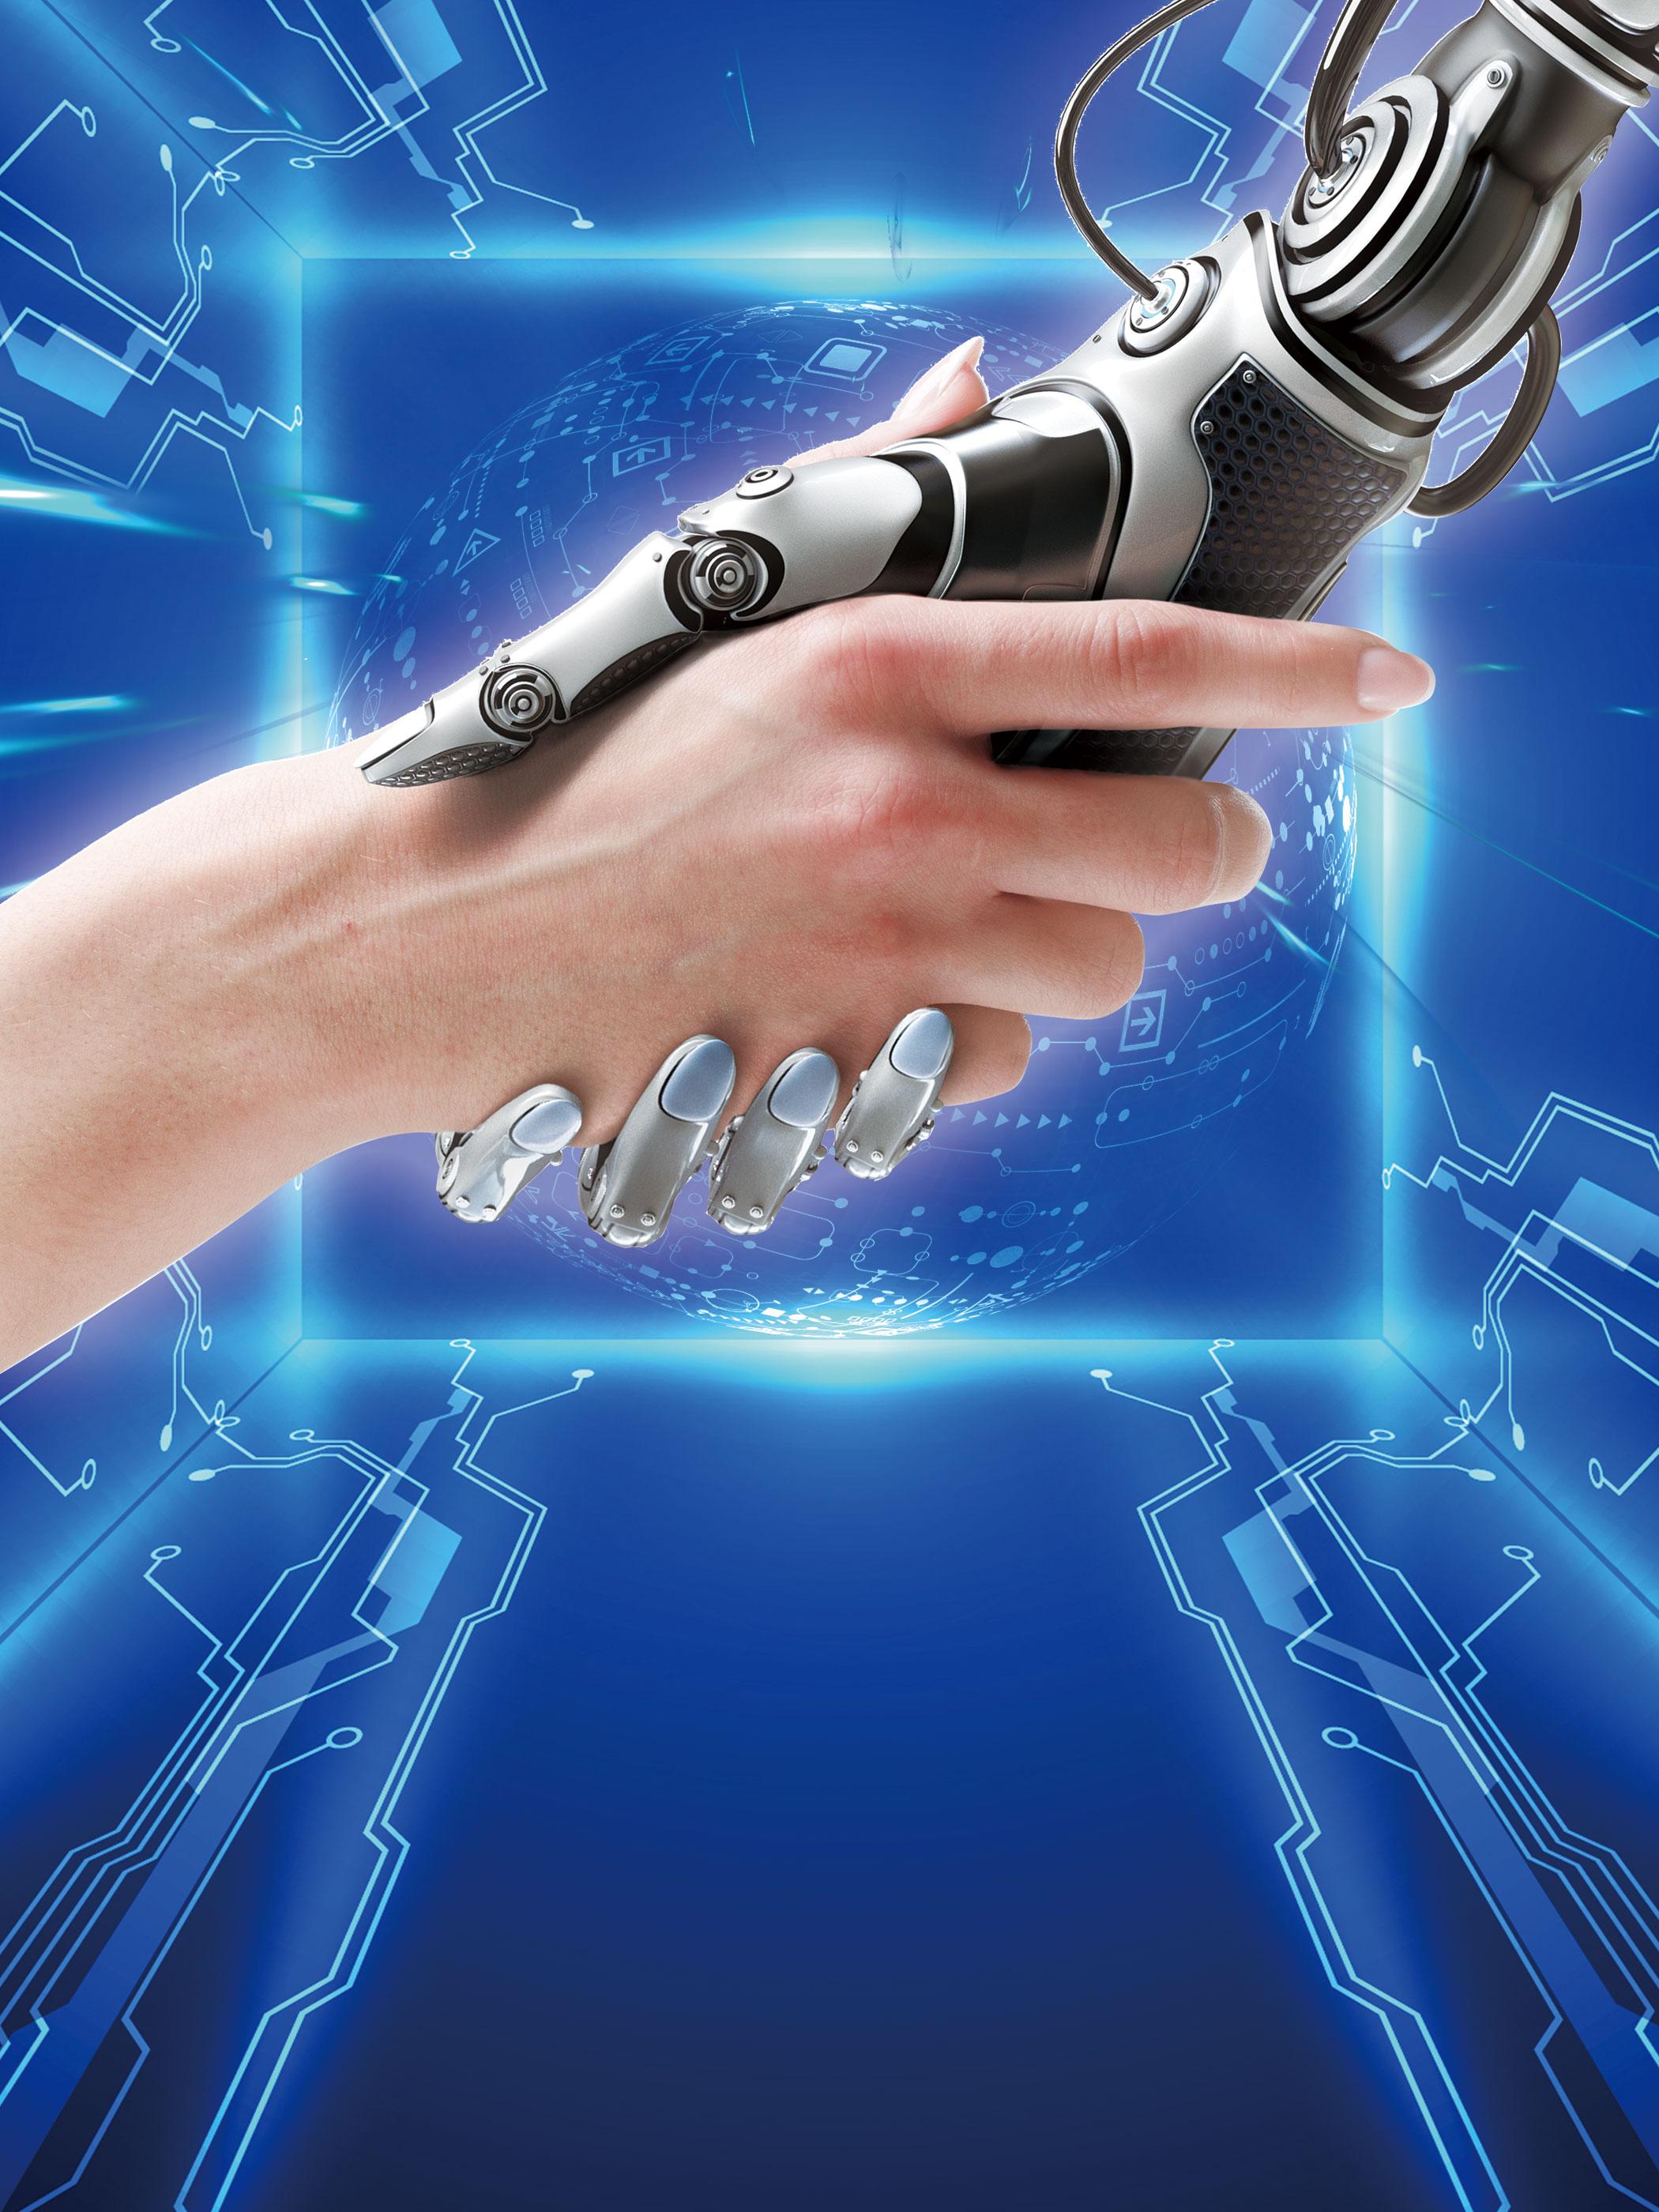 Blue Technology Created Future Technology Fashion